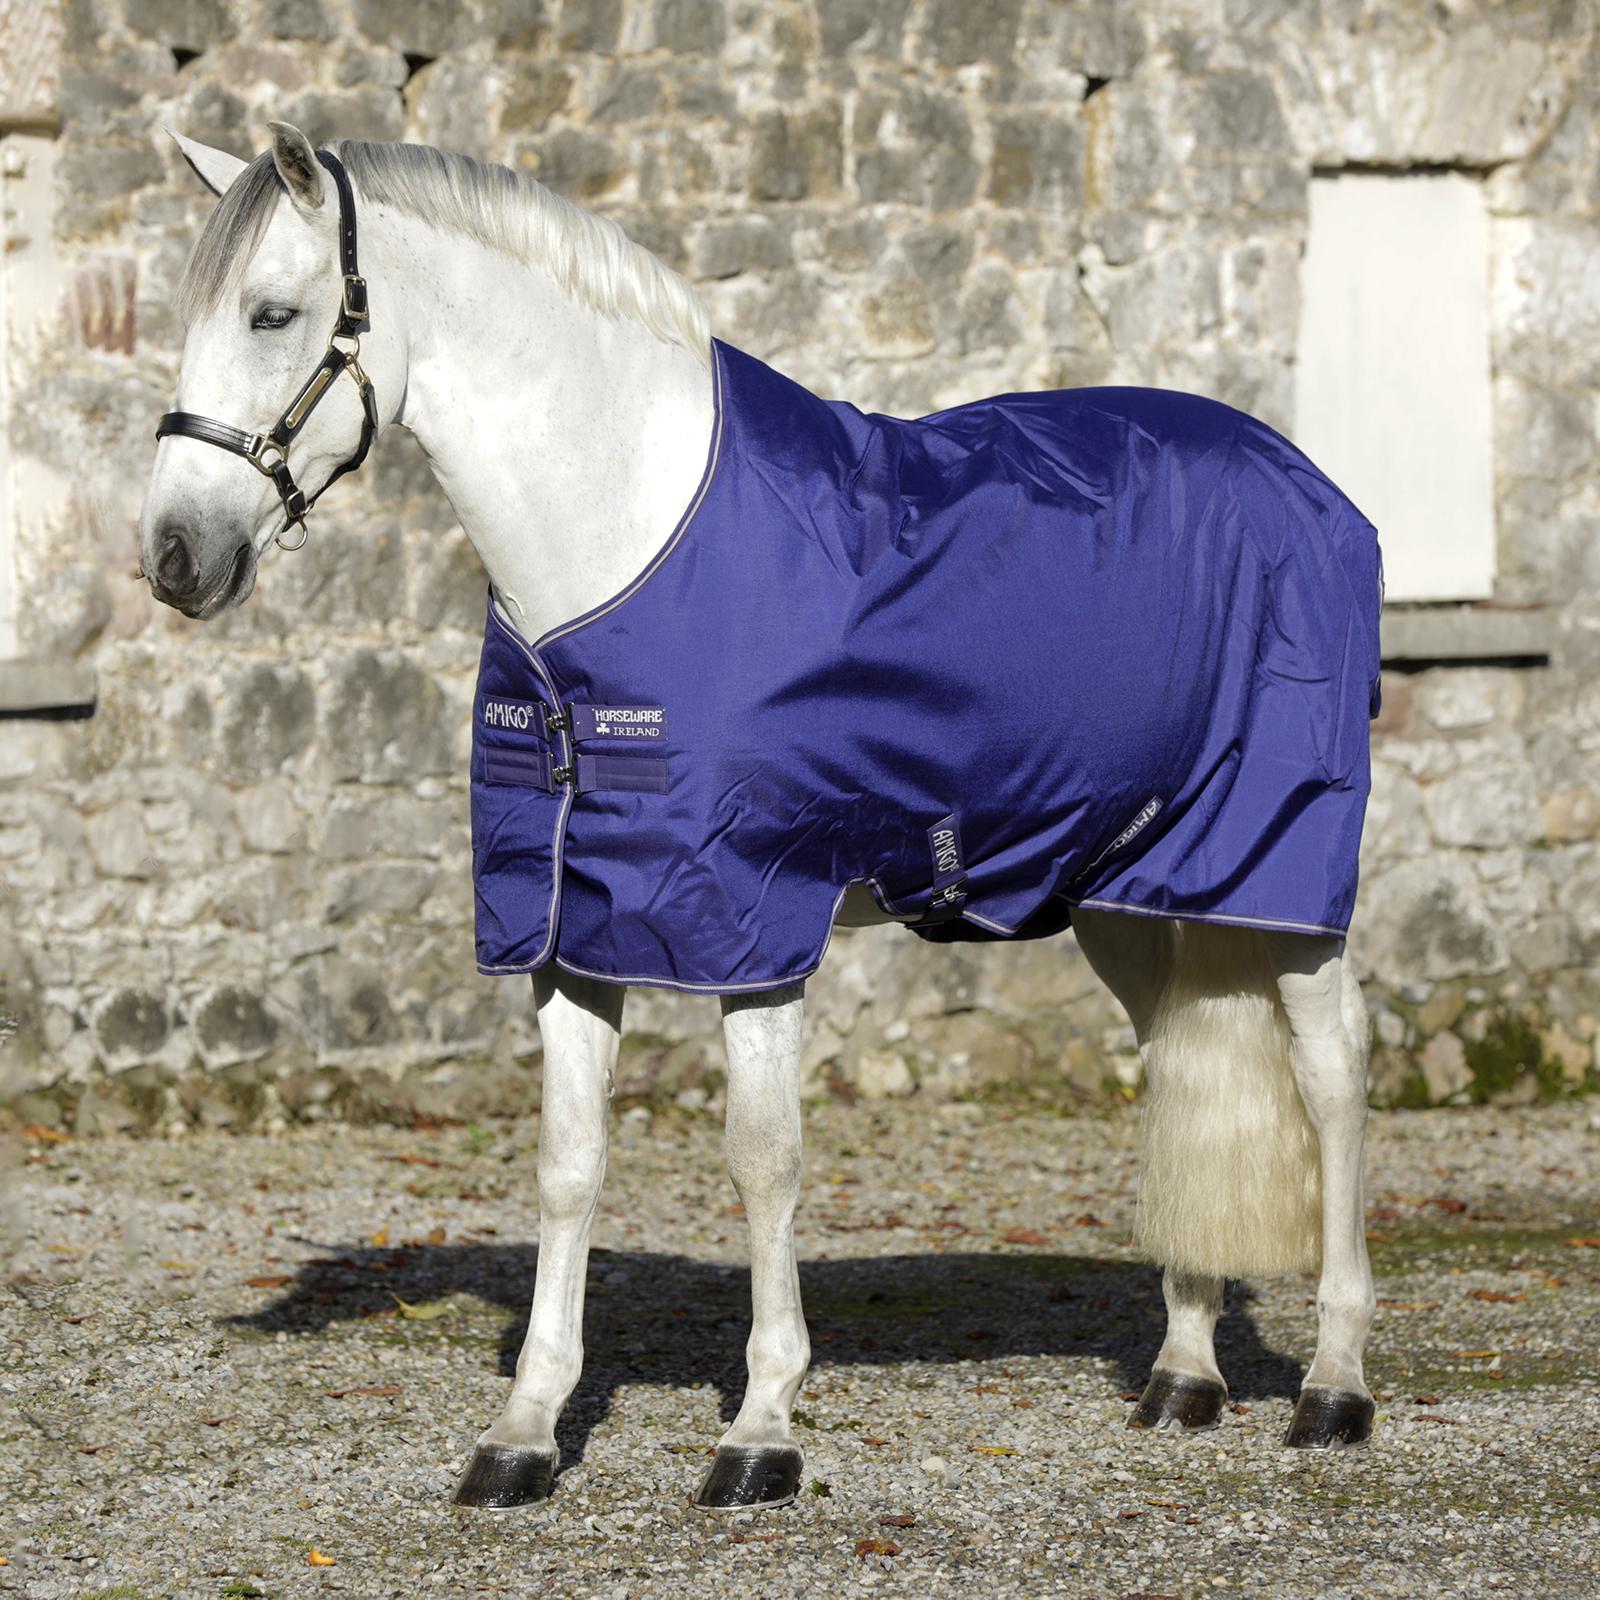 Horseware Amigo Le Rug 200g Horze